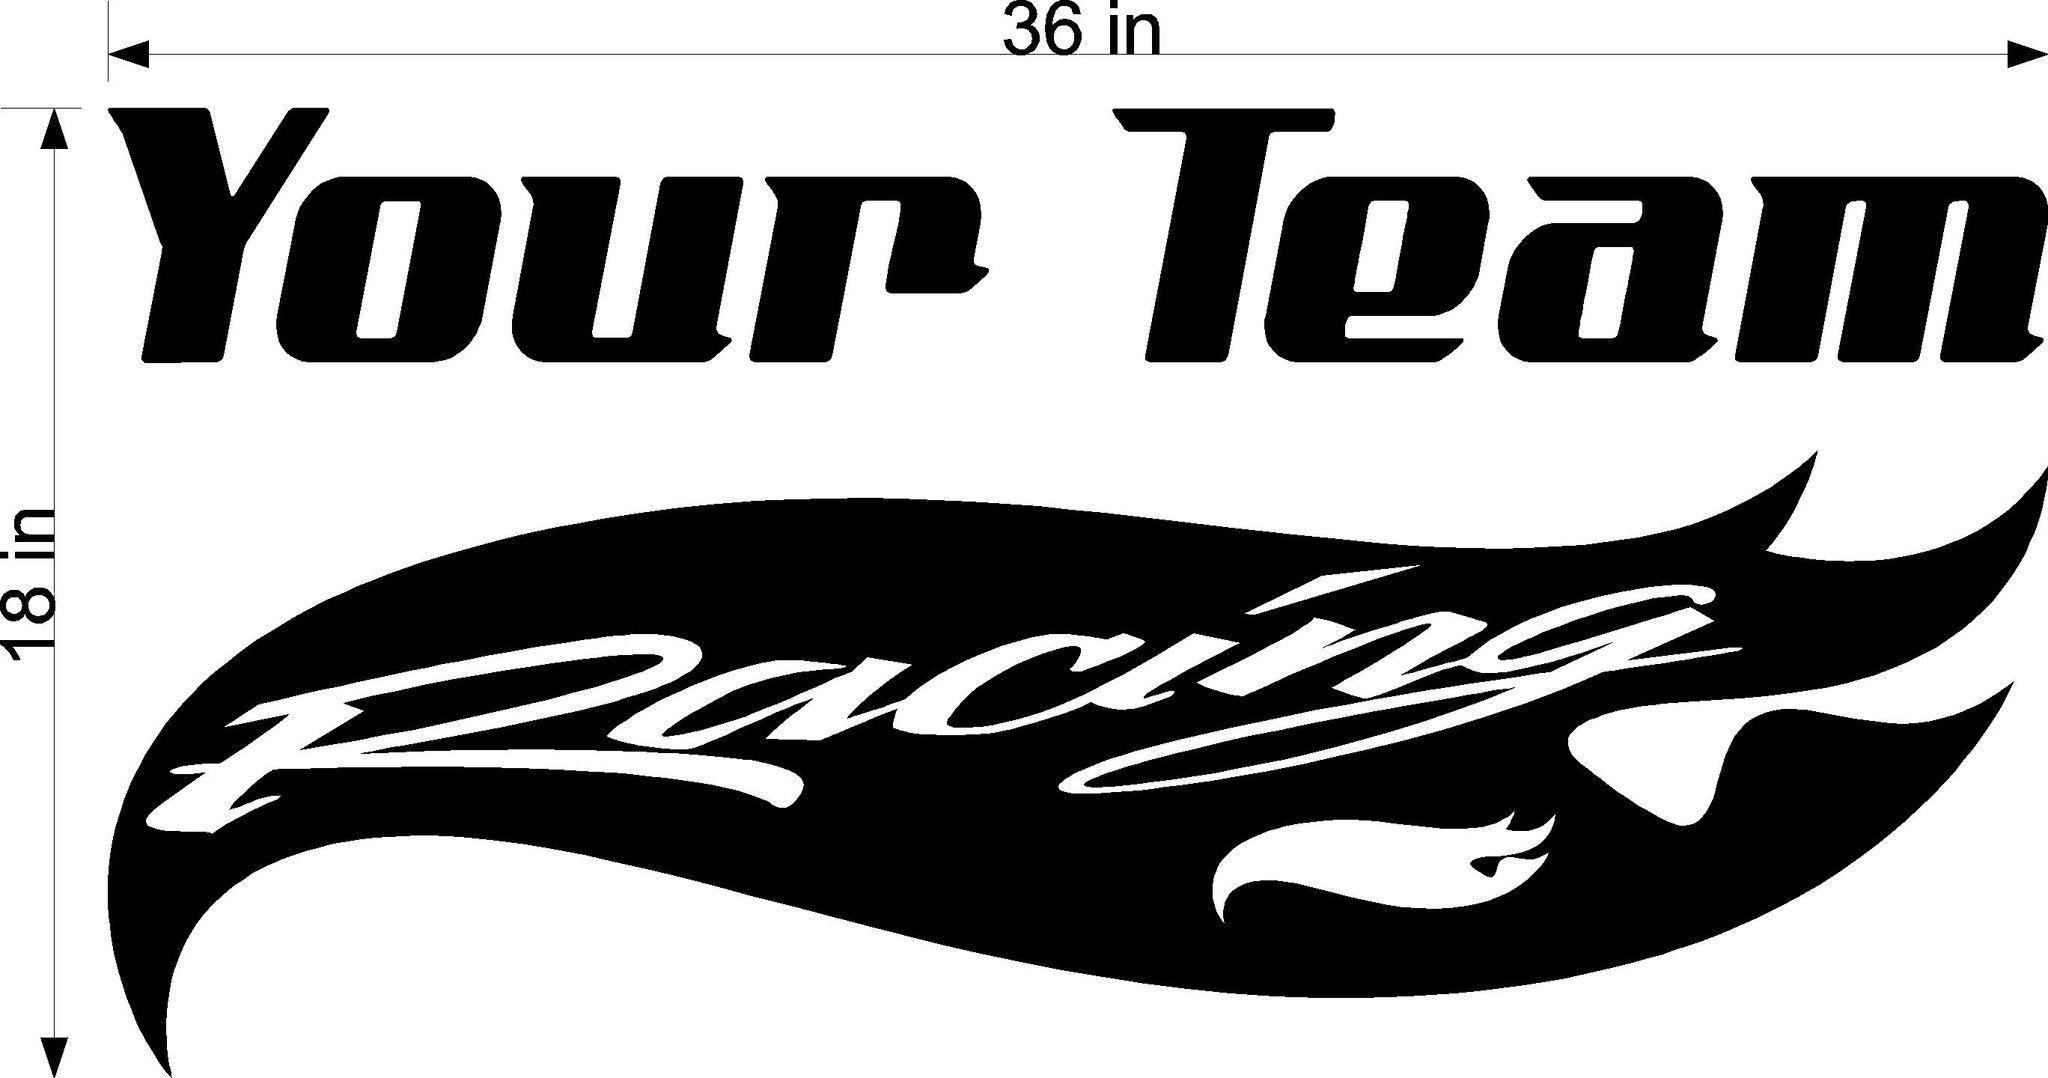 Racing Team Name Trailer Decal - Vinyl Decal - Custom Text -Trailer Sticker - YT009